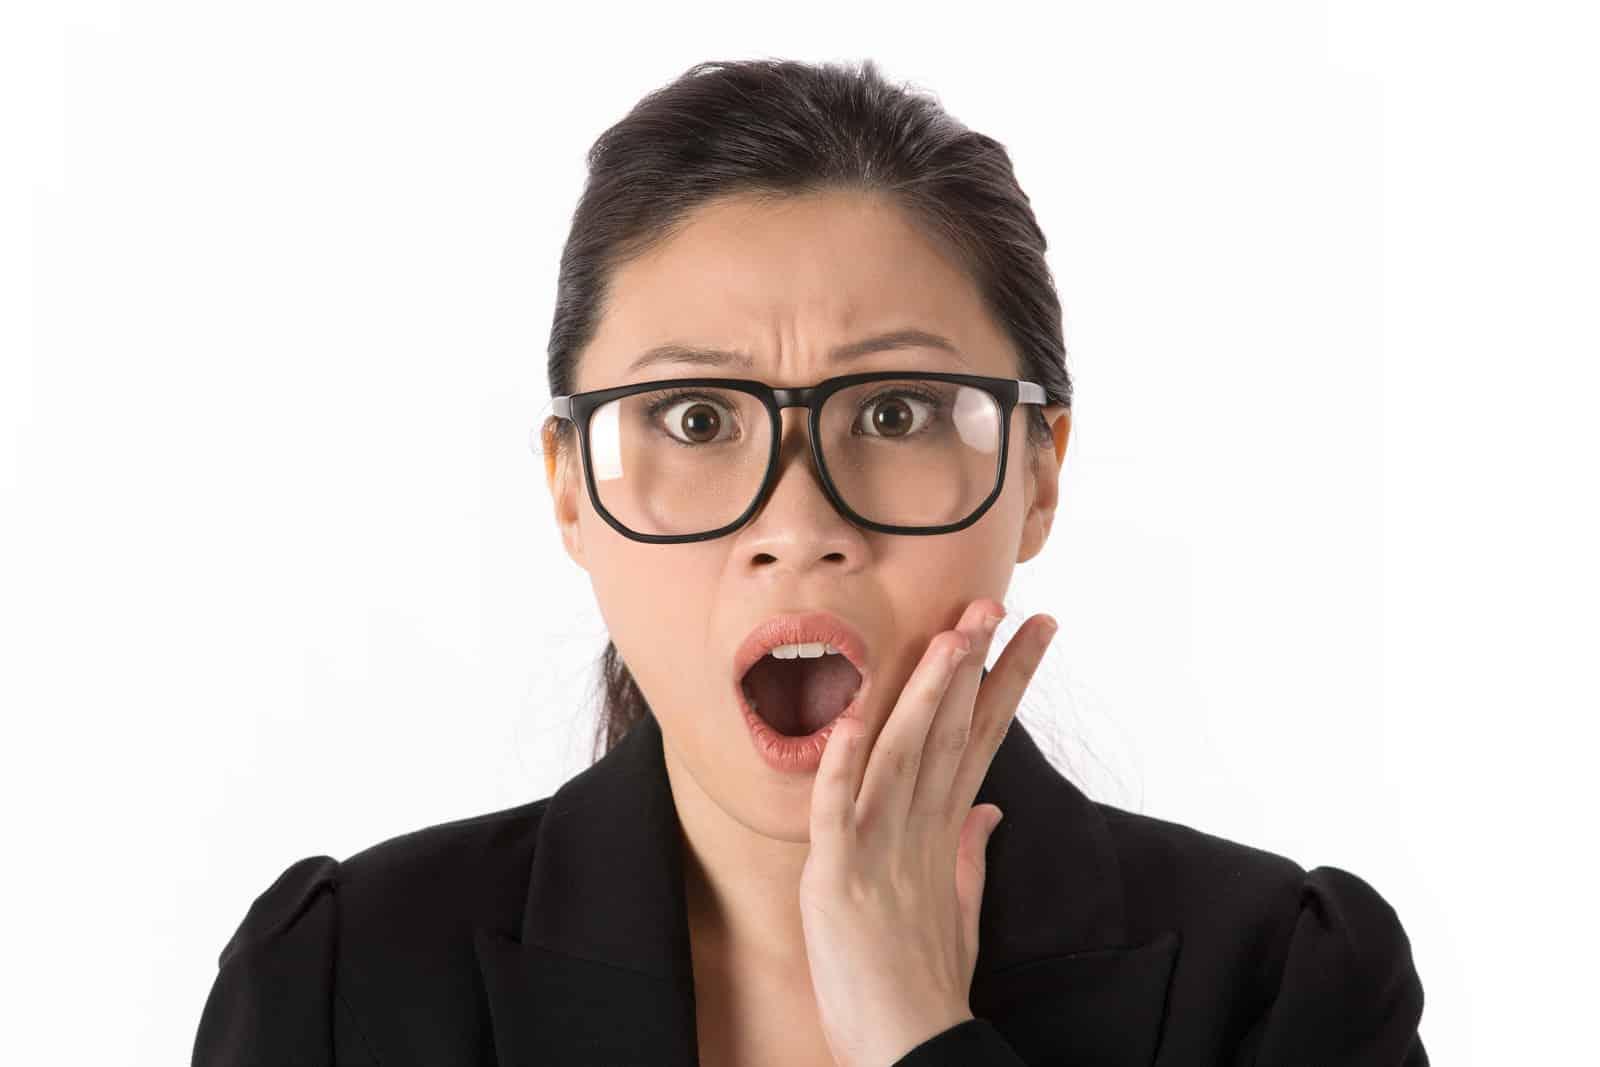 OMG! Shocked (10620012)